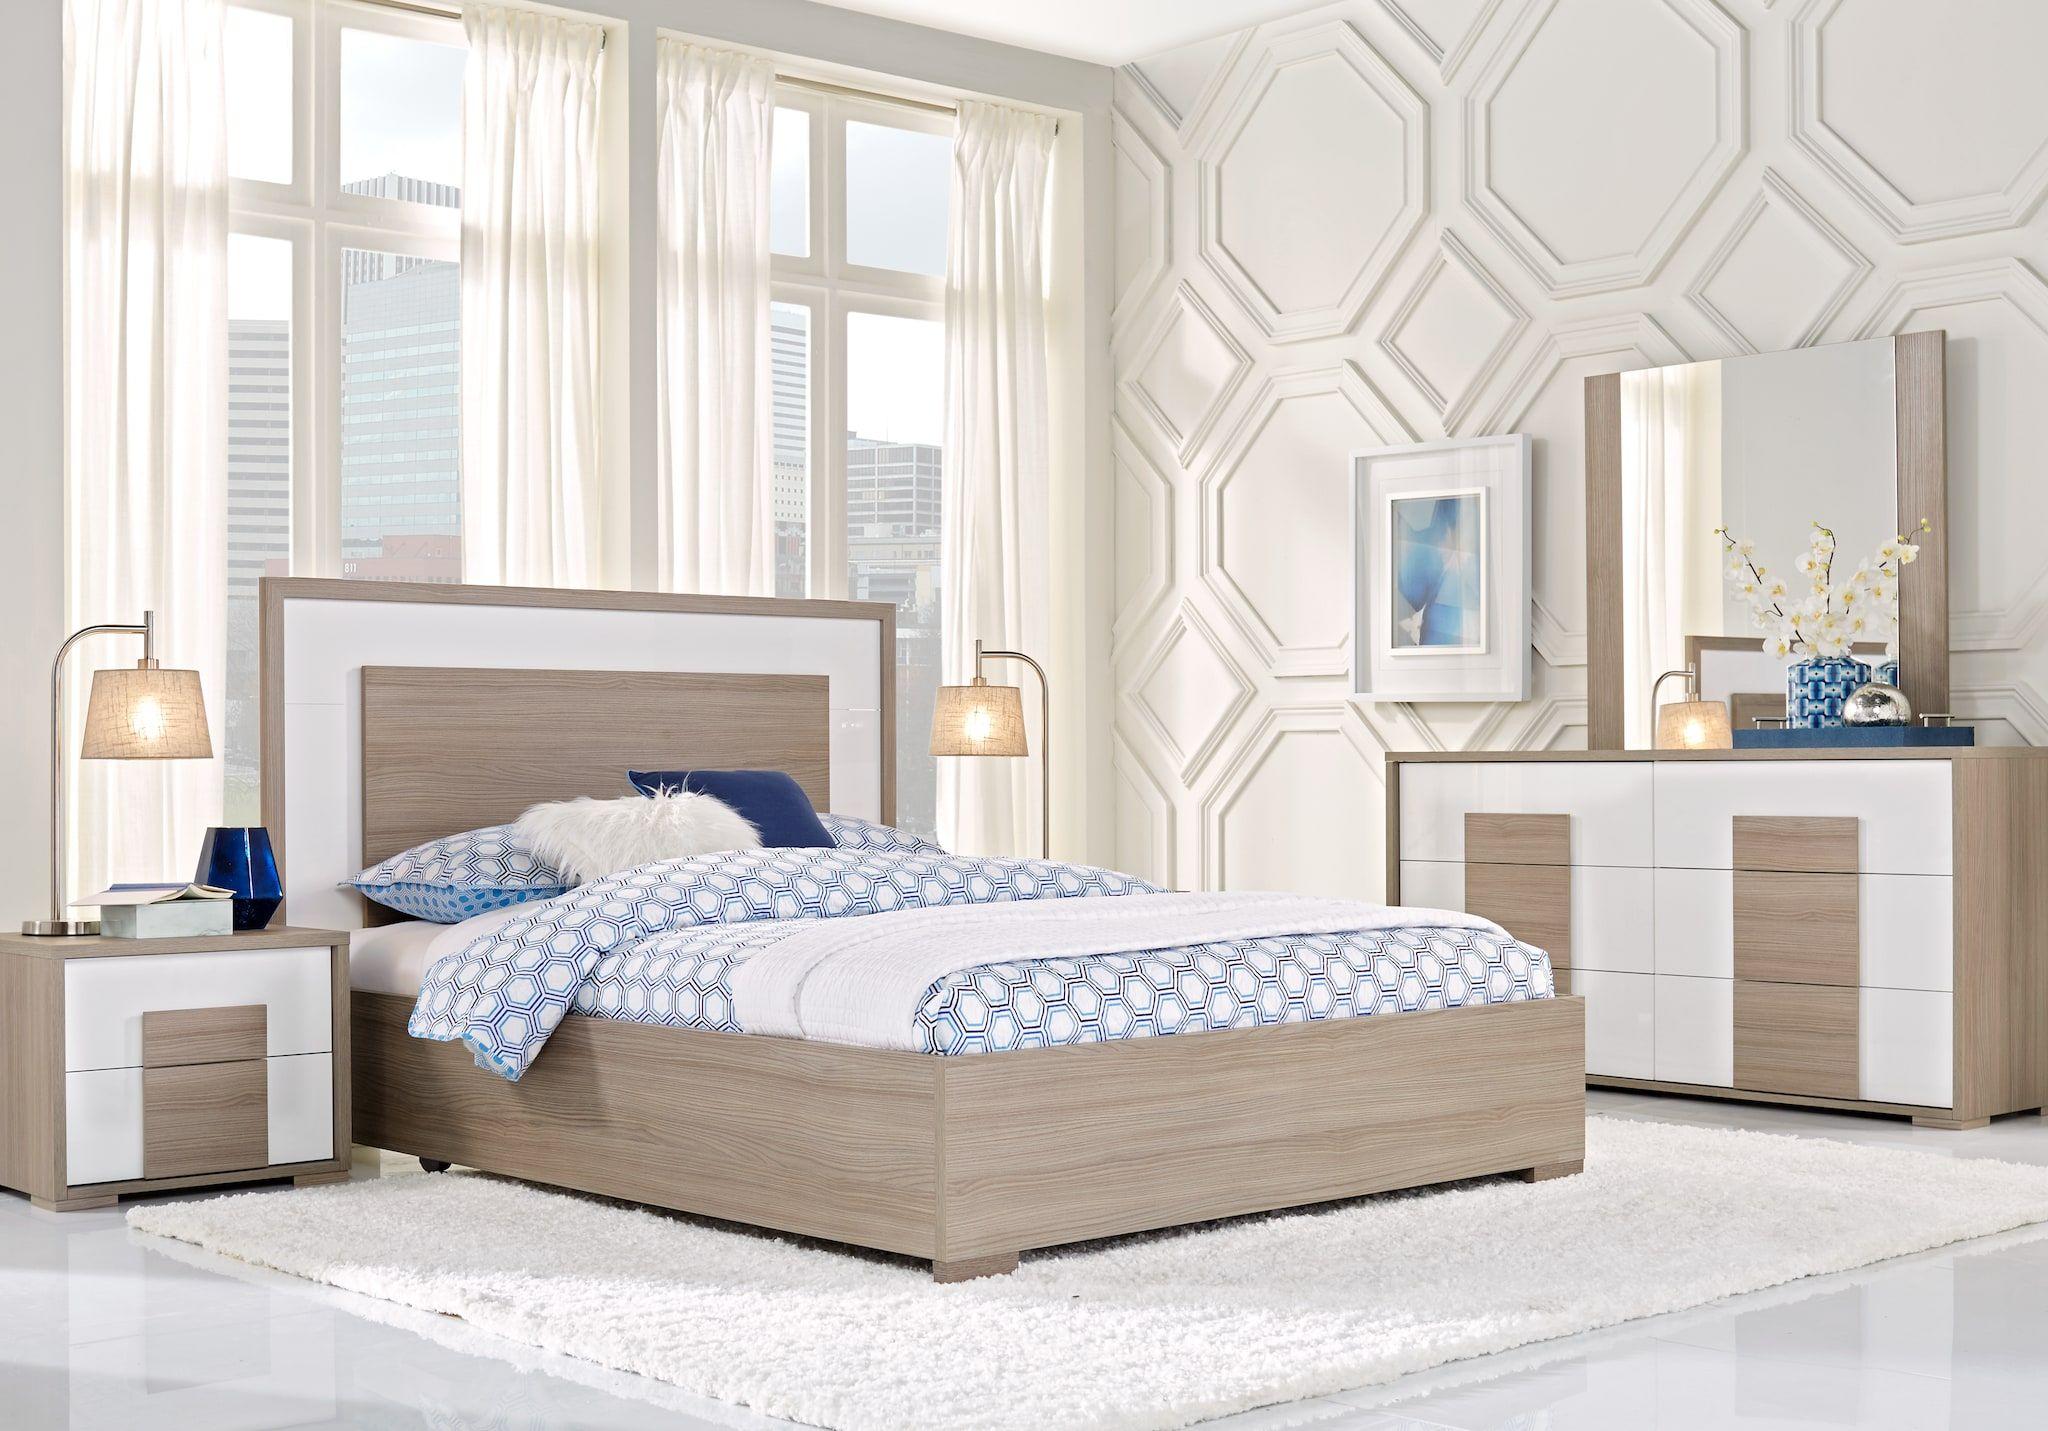 Best Affordable Queen Bedroom Sets For Sale 5 6 Piece Suites 400 x 300